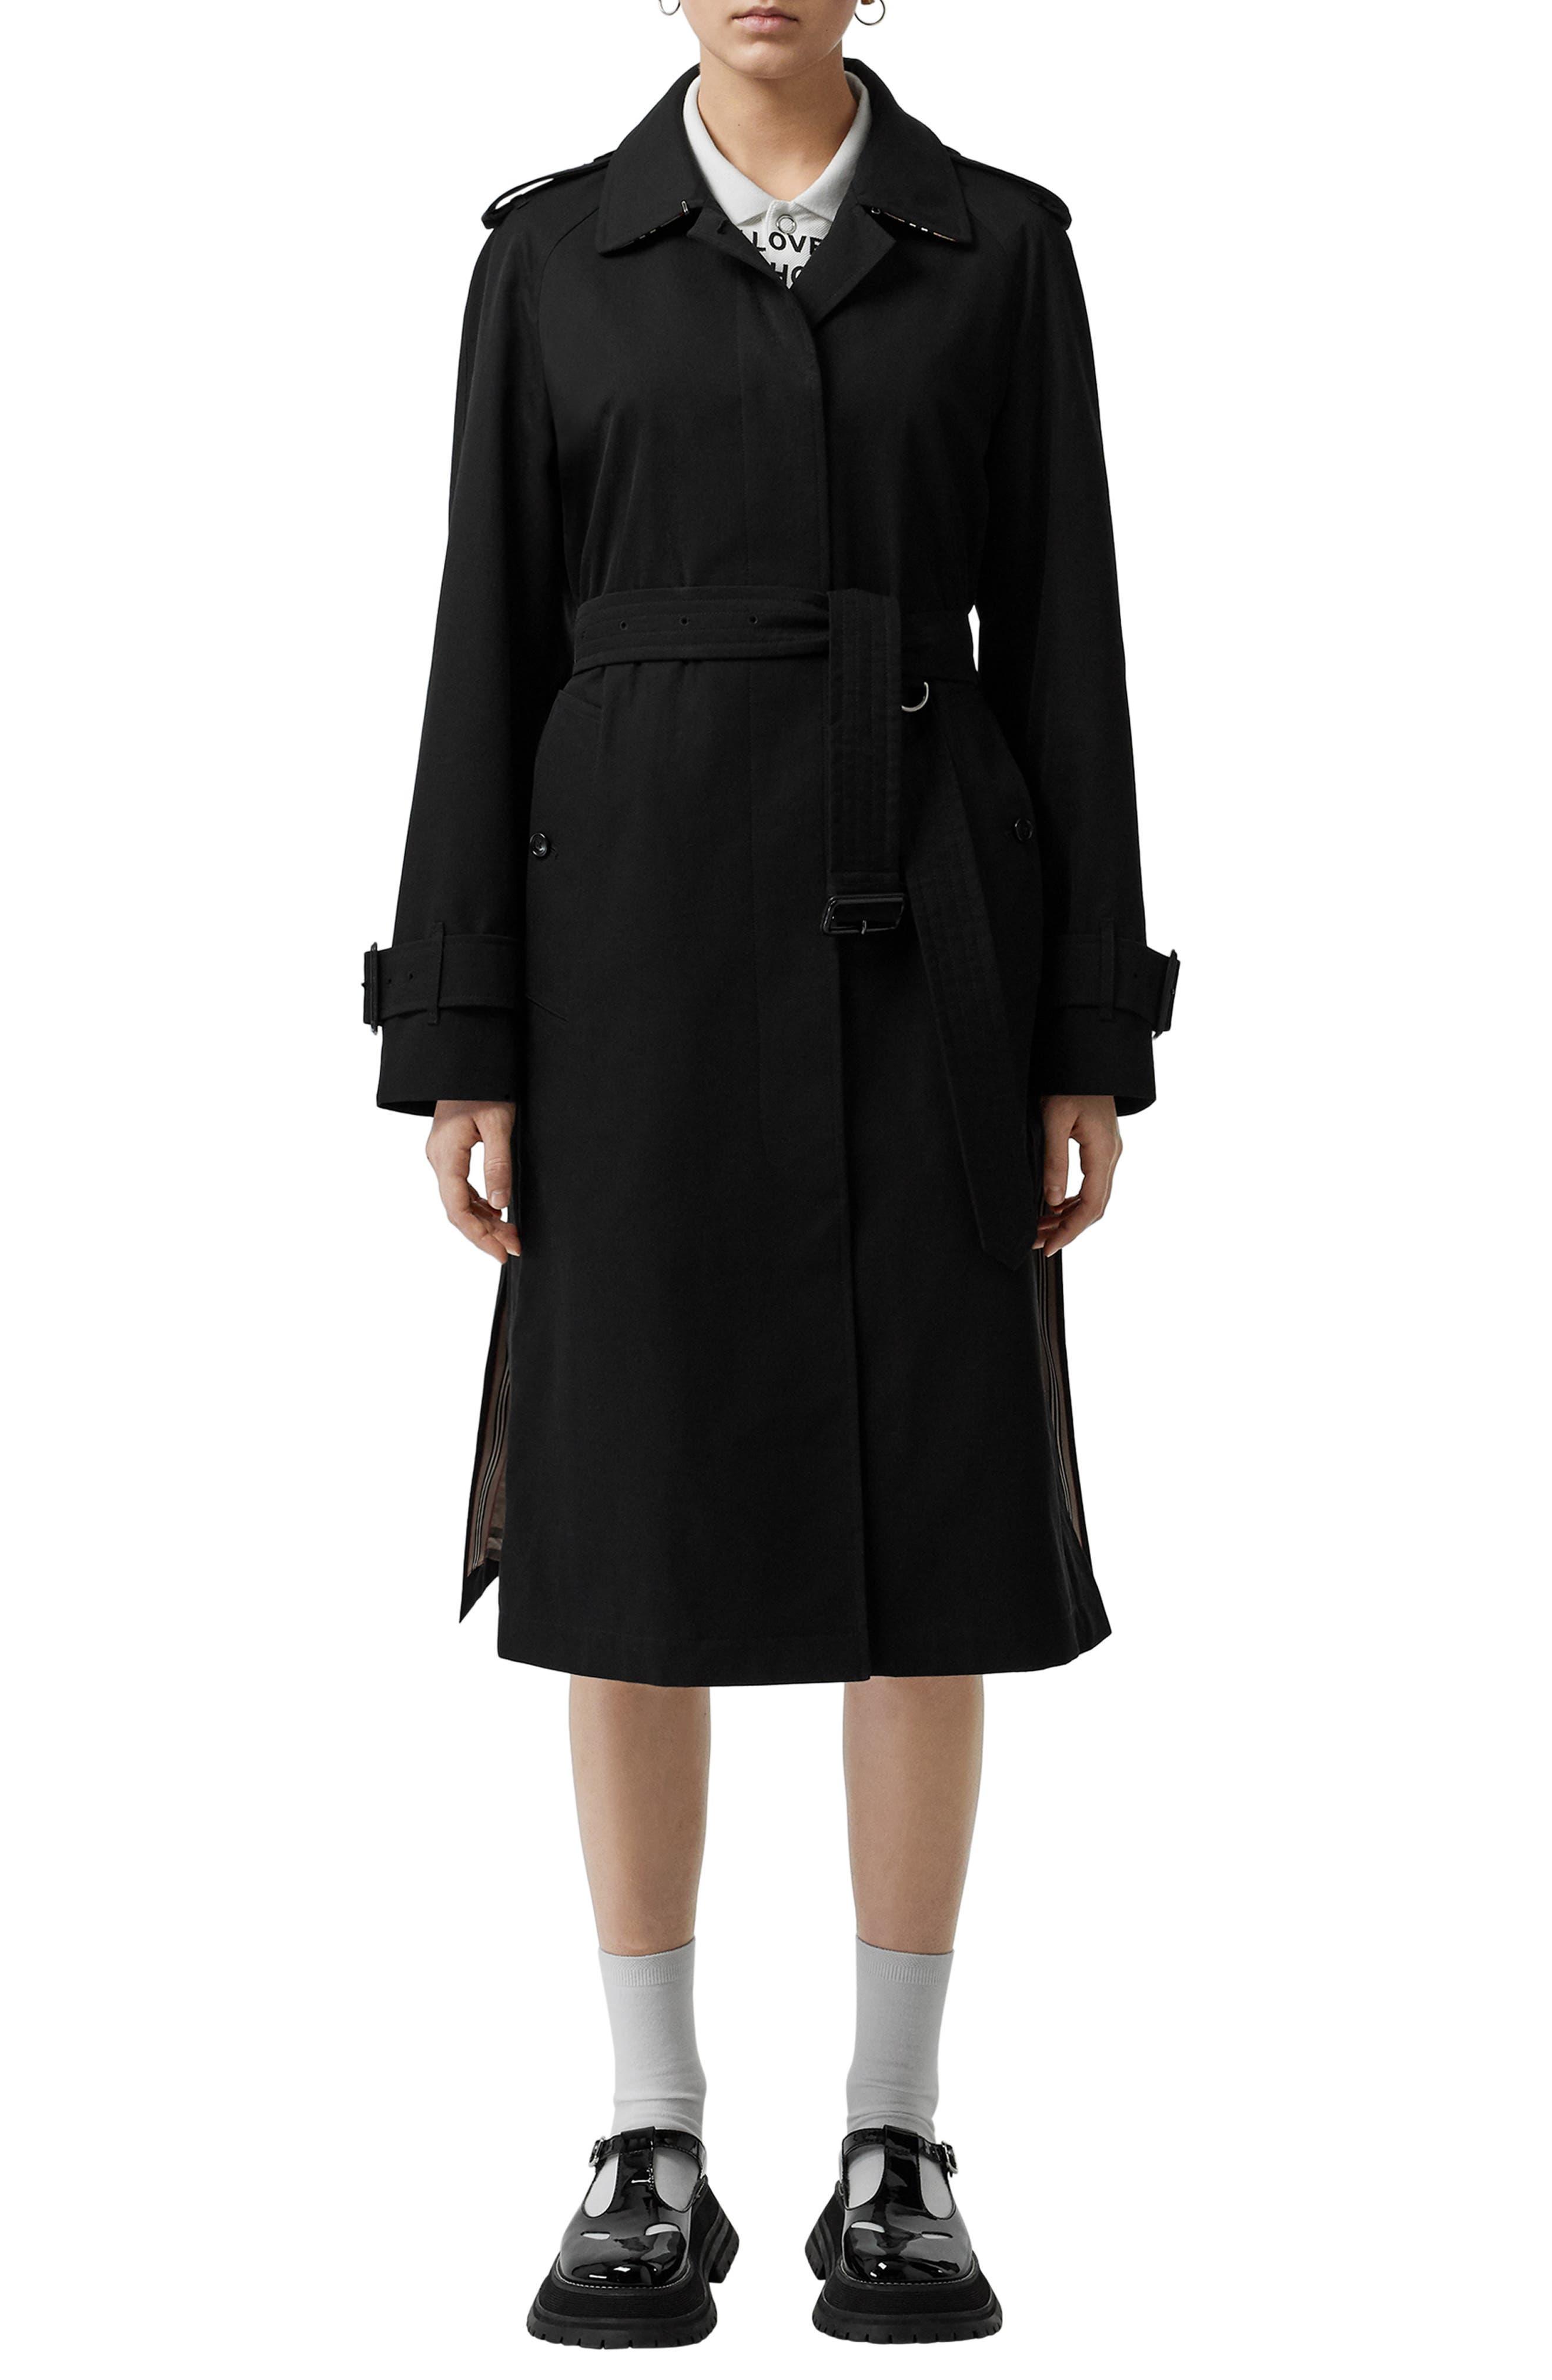 BURBERRY Crostwick Side Slit Tropical Gabardine Trench Coat, Main, color, BLACK